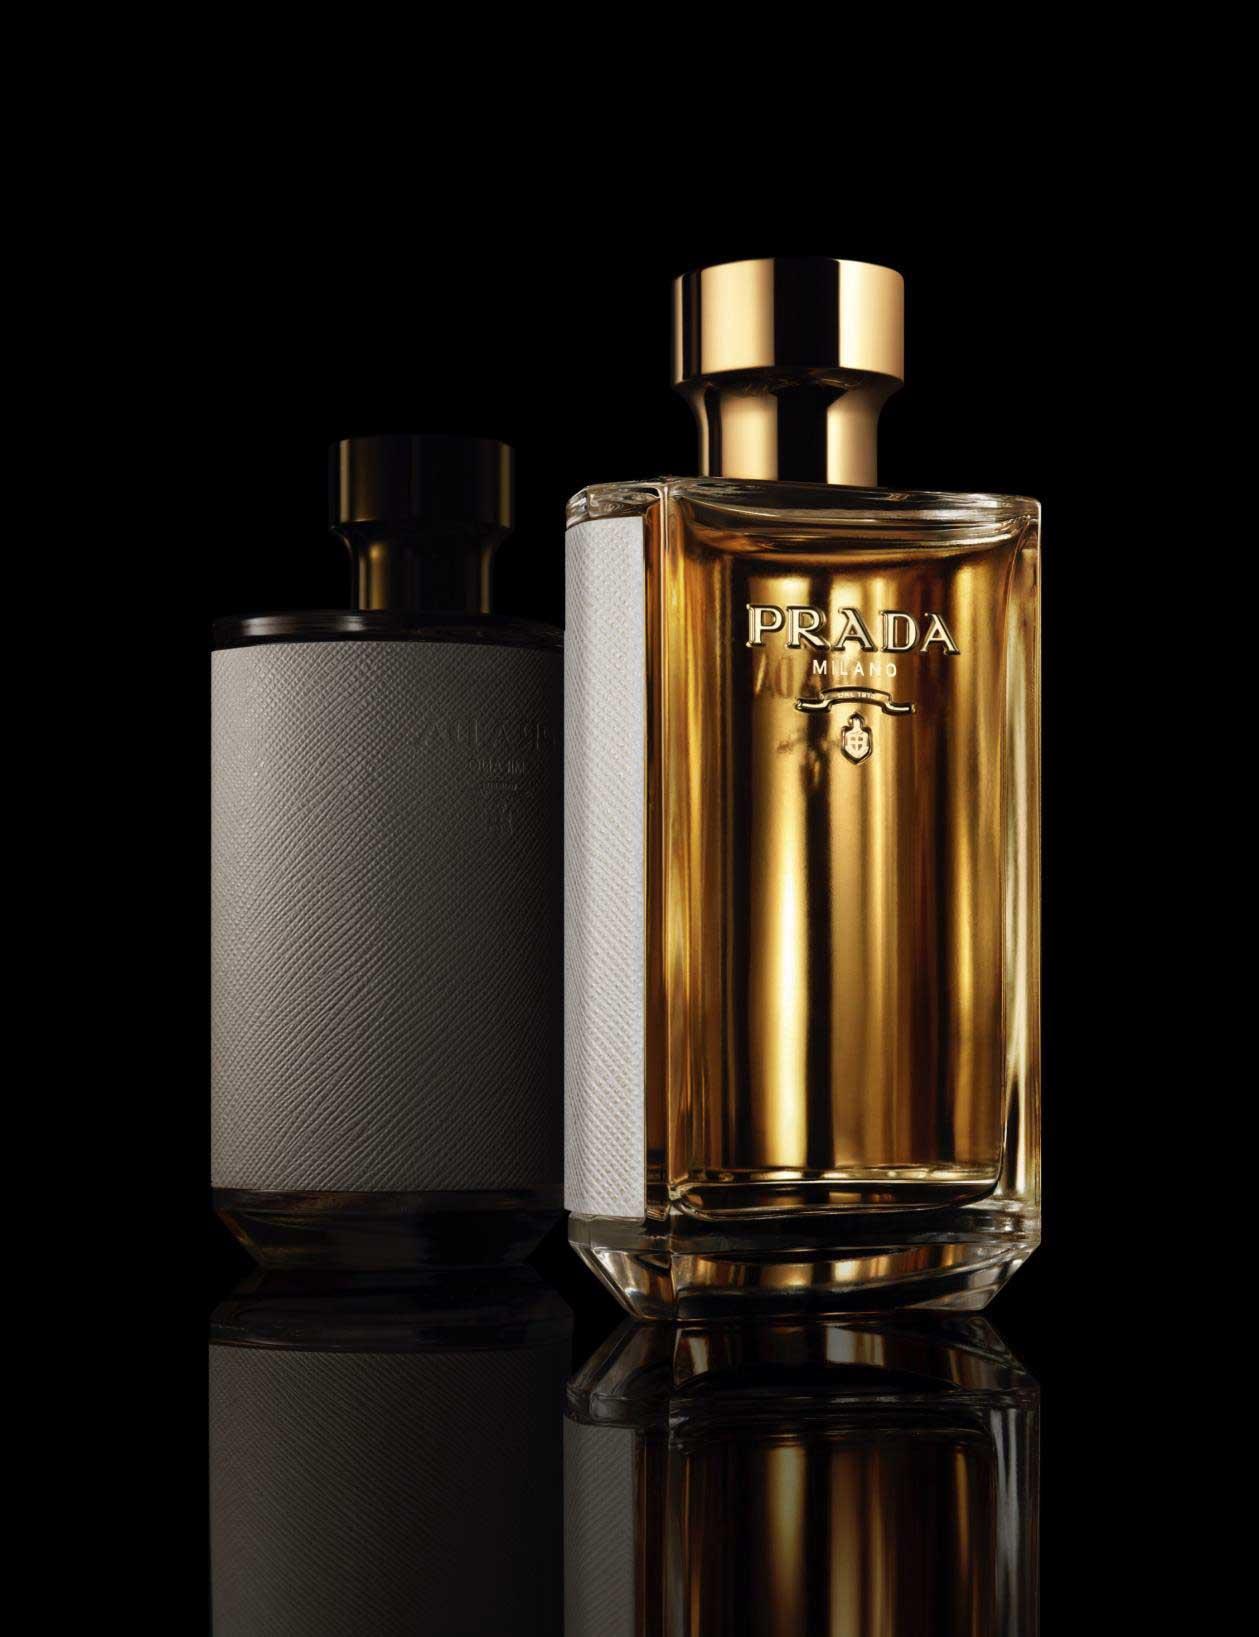 Prada La Femme bottle